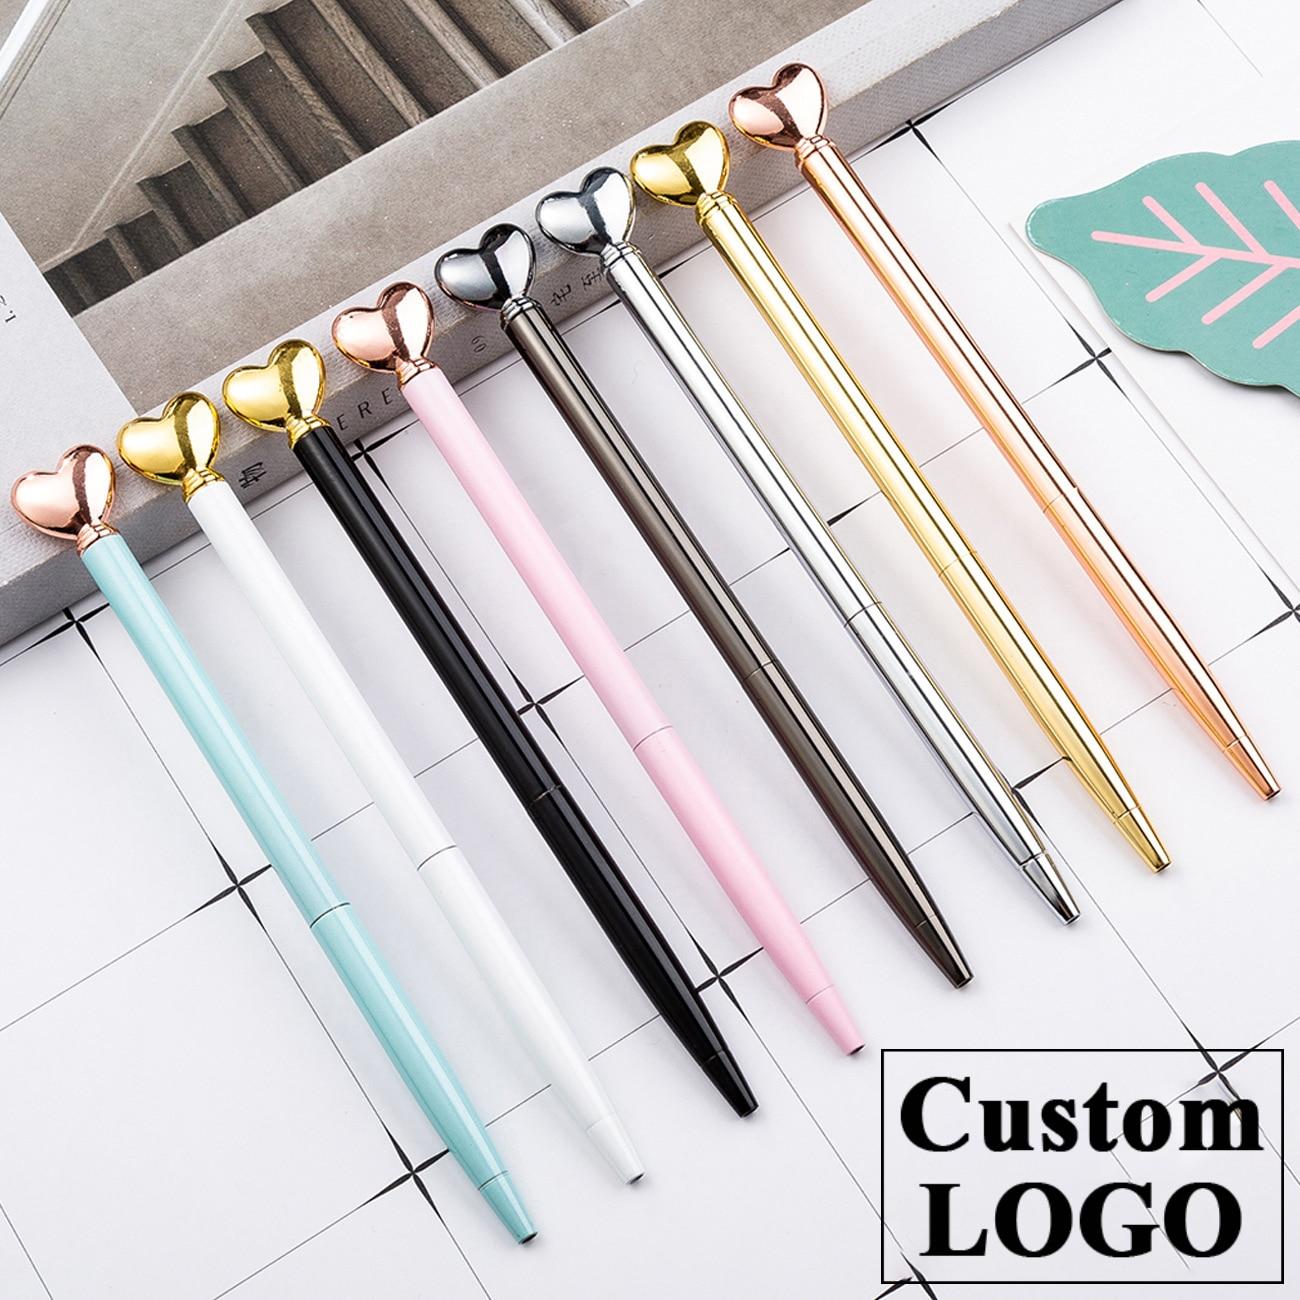 Metal Pen Love Shape Ballpoint Pen Gift Advertising Pen Wedding Gift Ballpoint Pen Novelty Pens Office&school Supply Custom LOGO